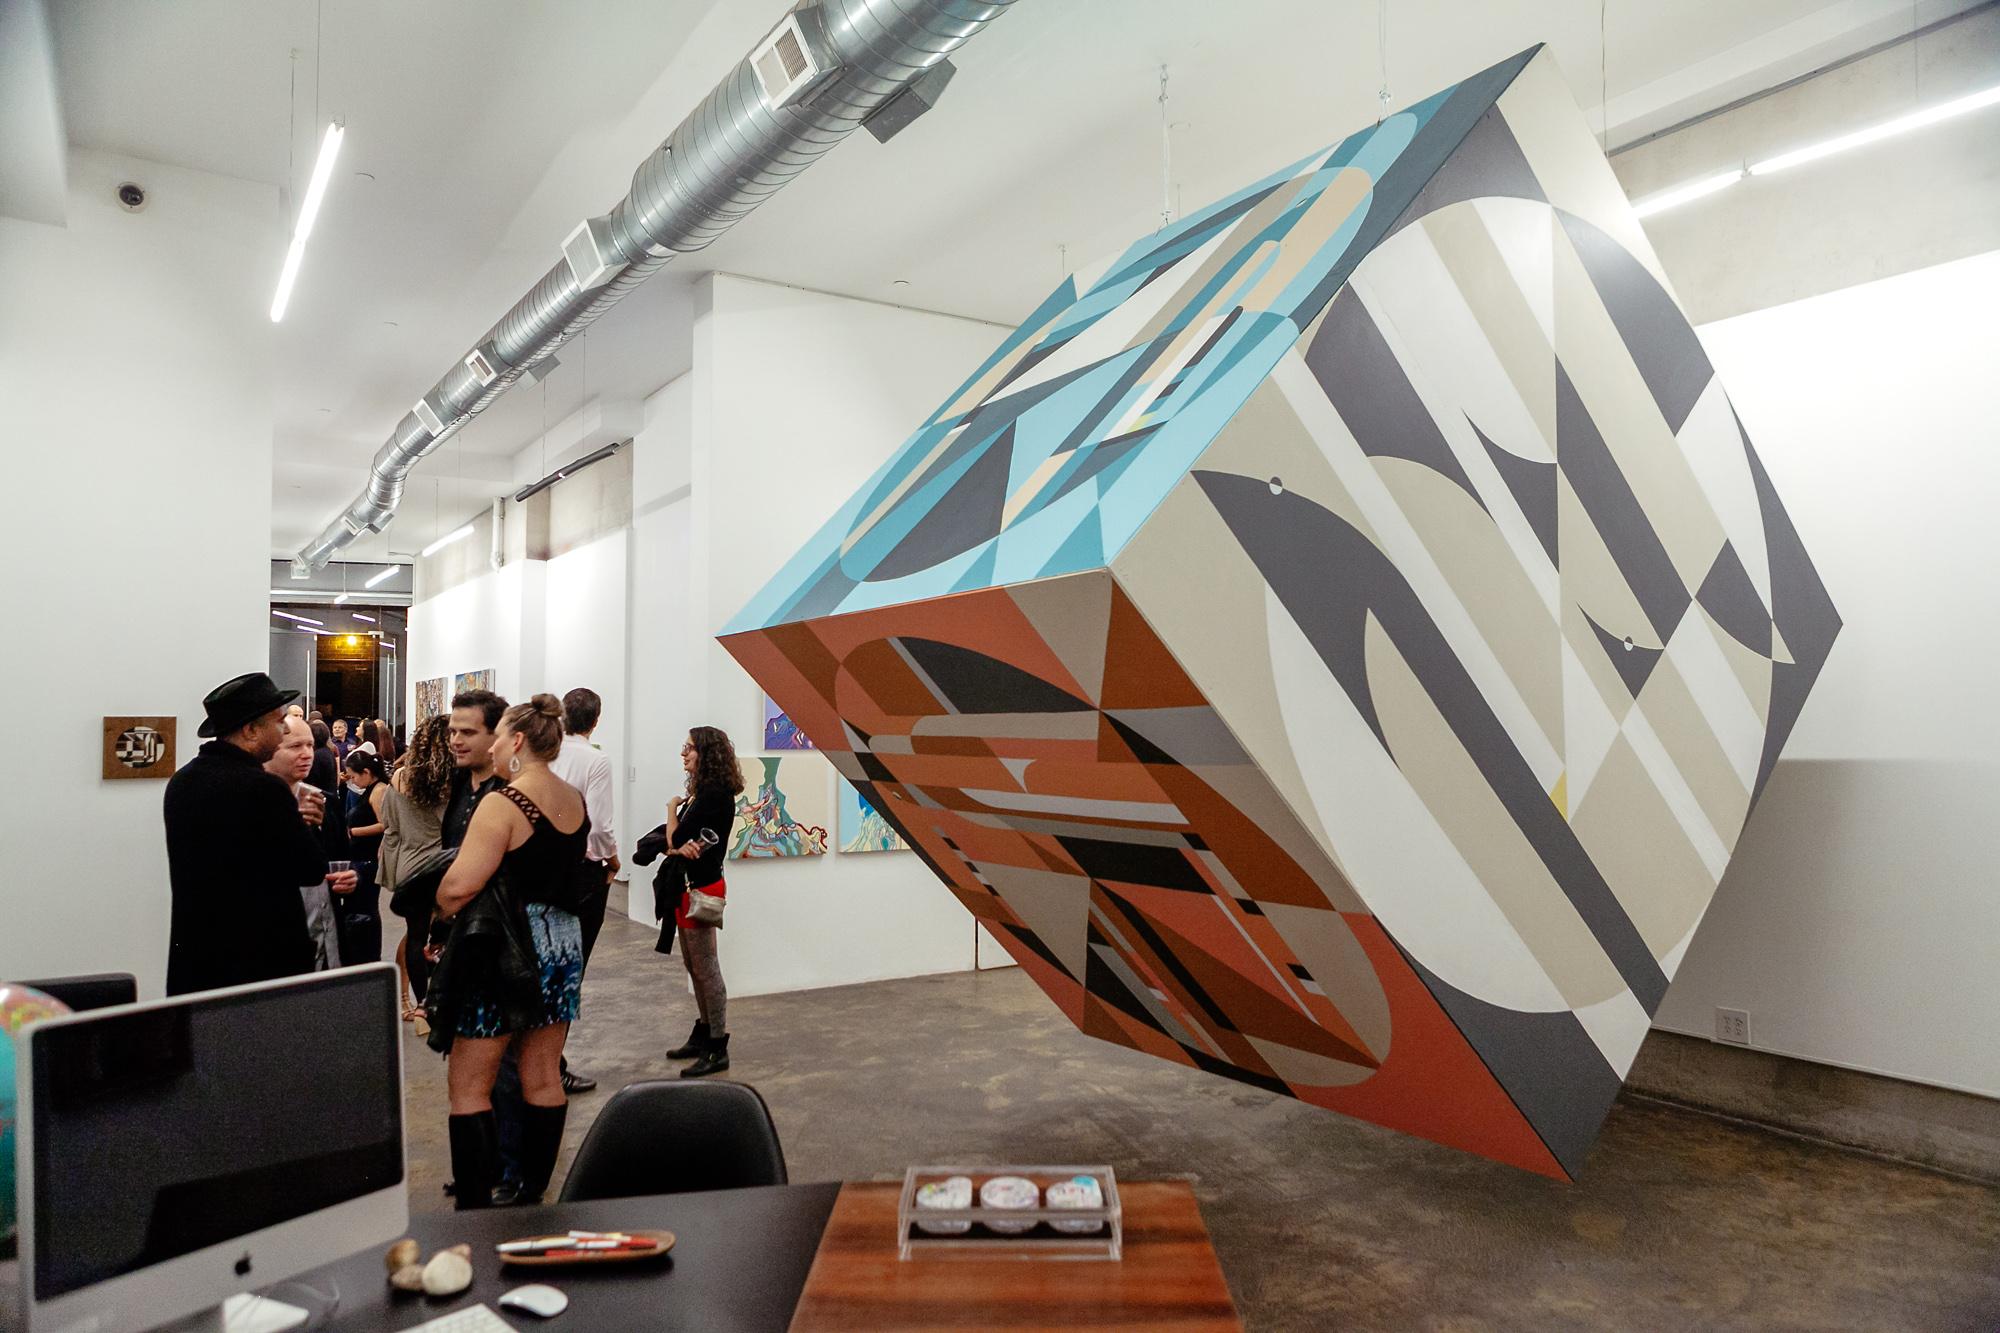 Rubins Cube-Gallery Nine5-New York 2014.jpg